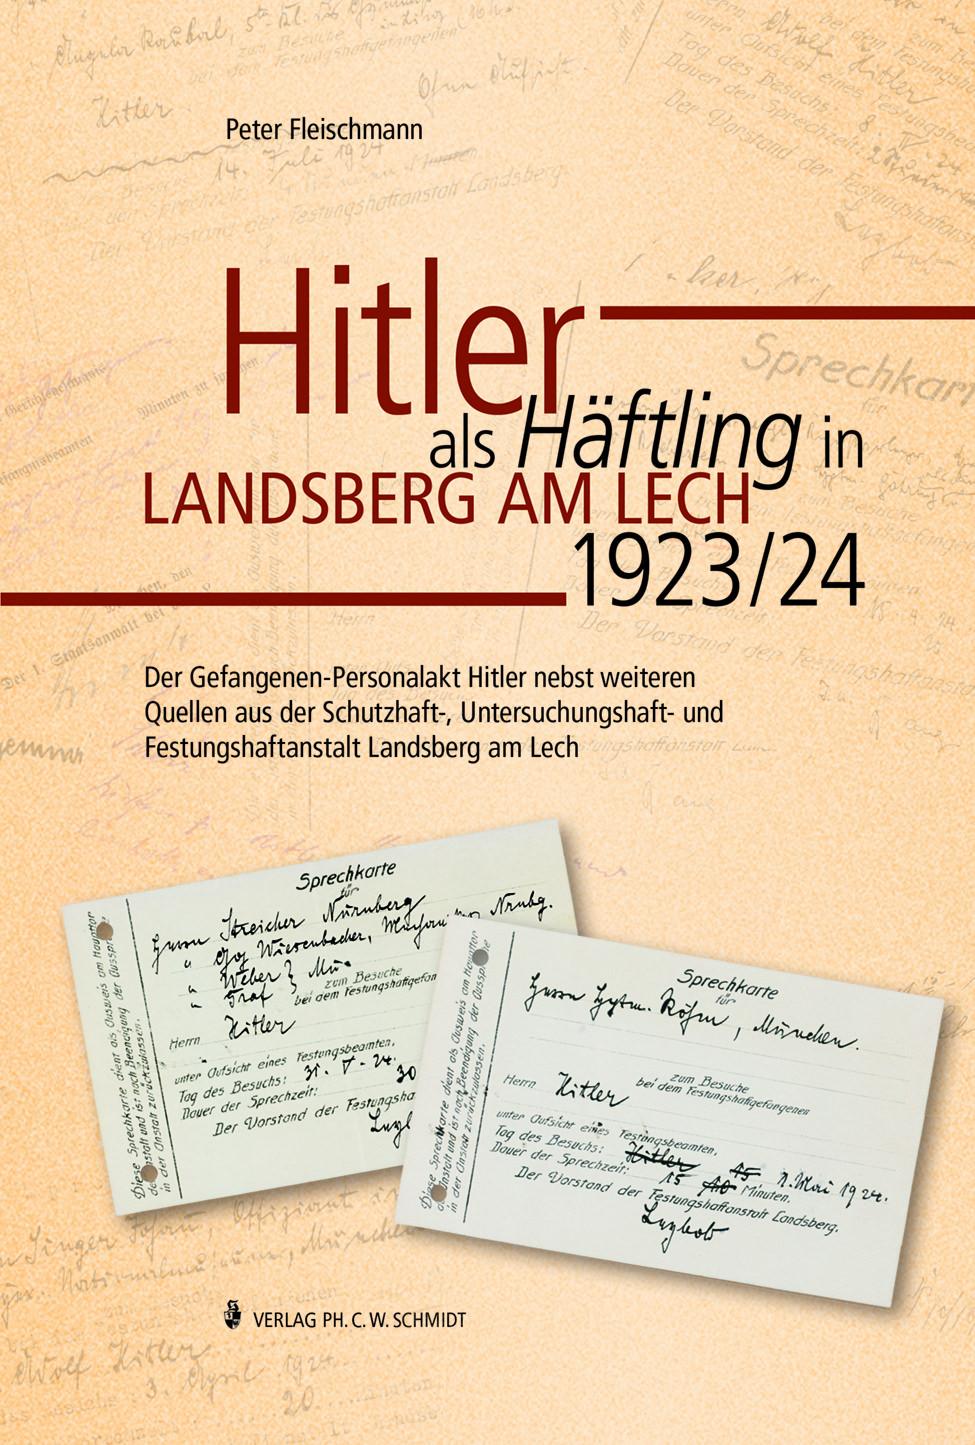 Fleischmann Peter - Hitler als Häftling in Landsberg am Lech 1923/24